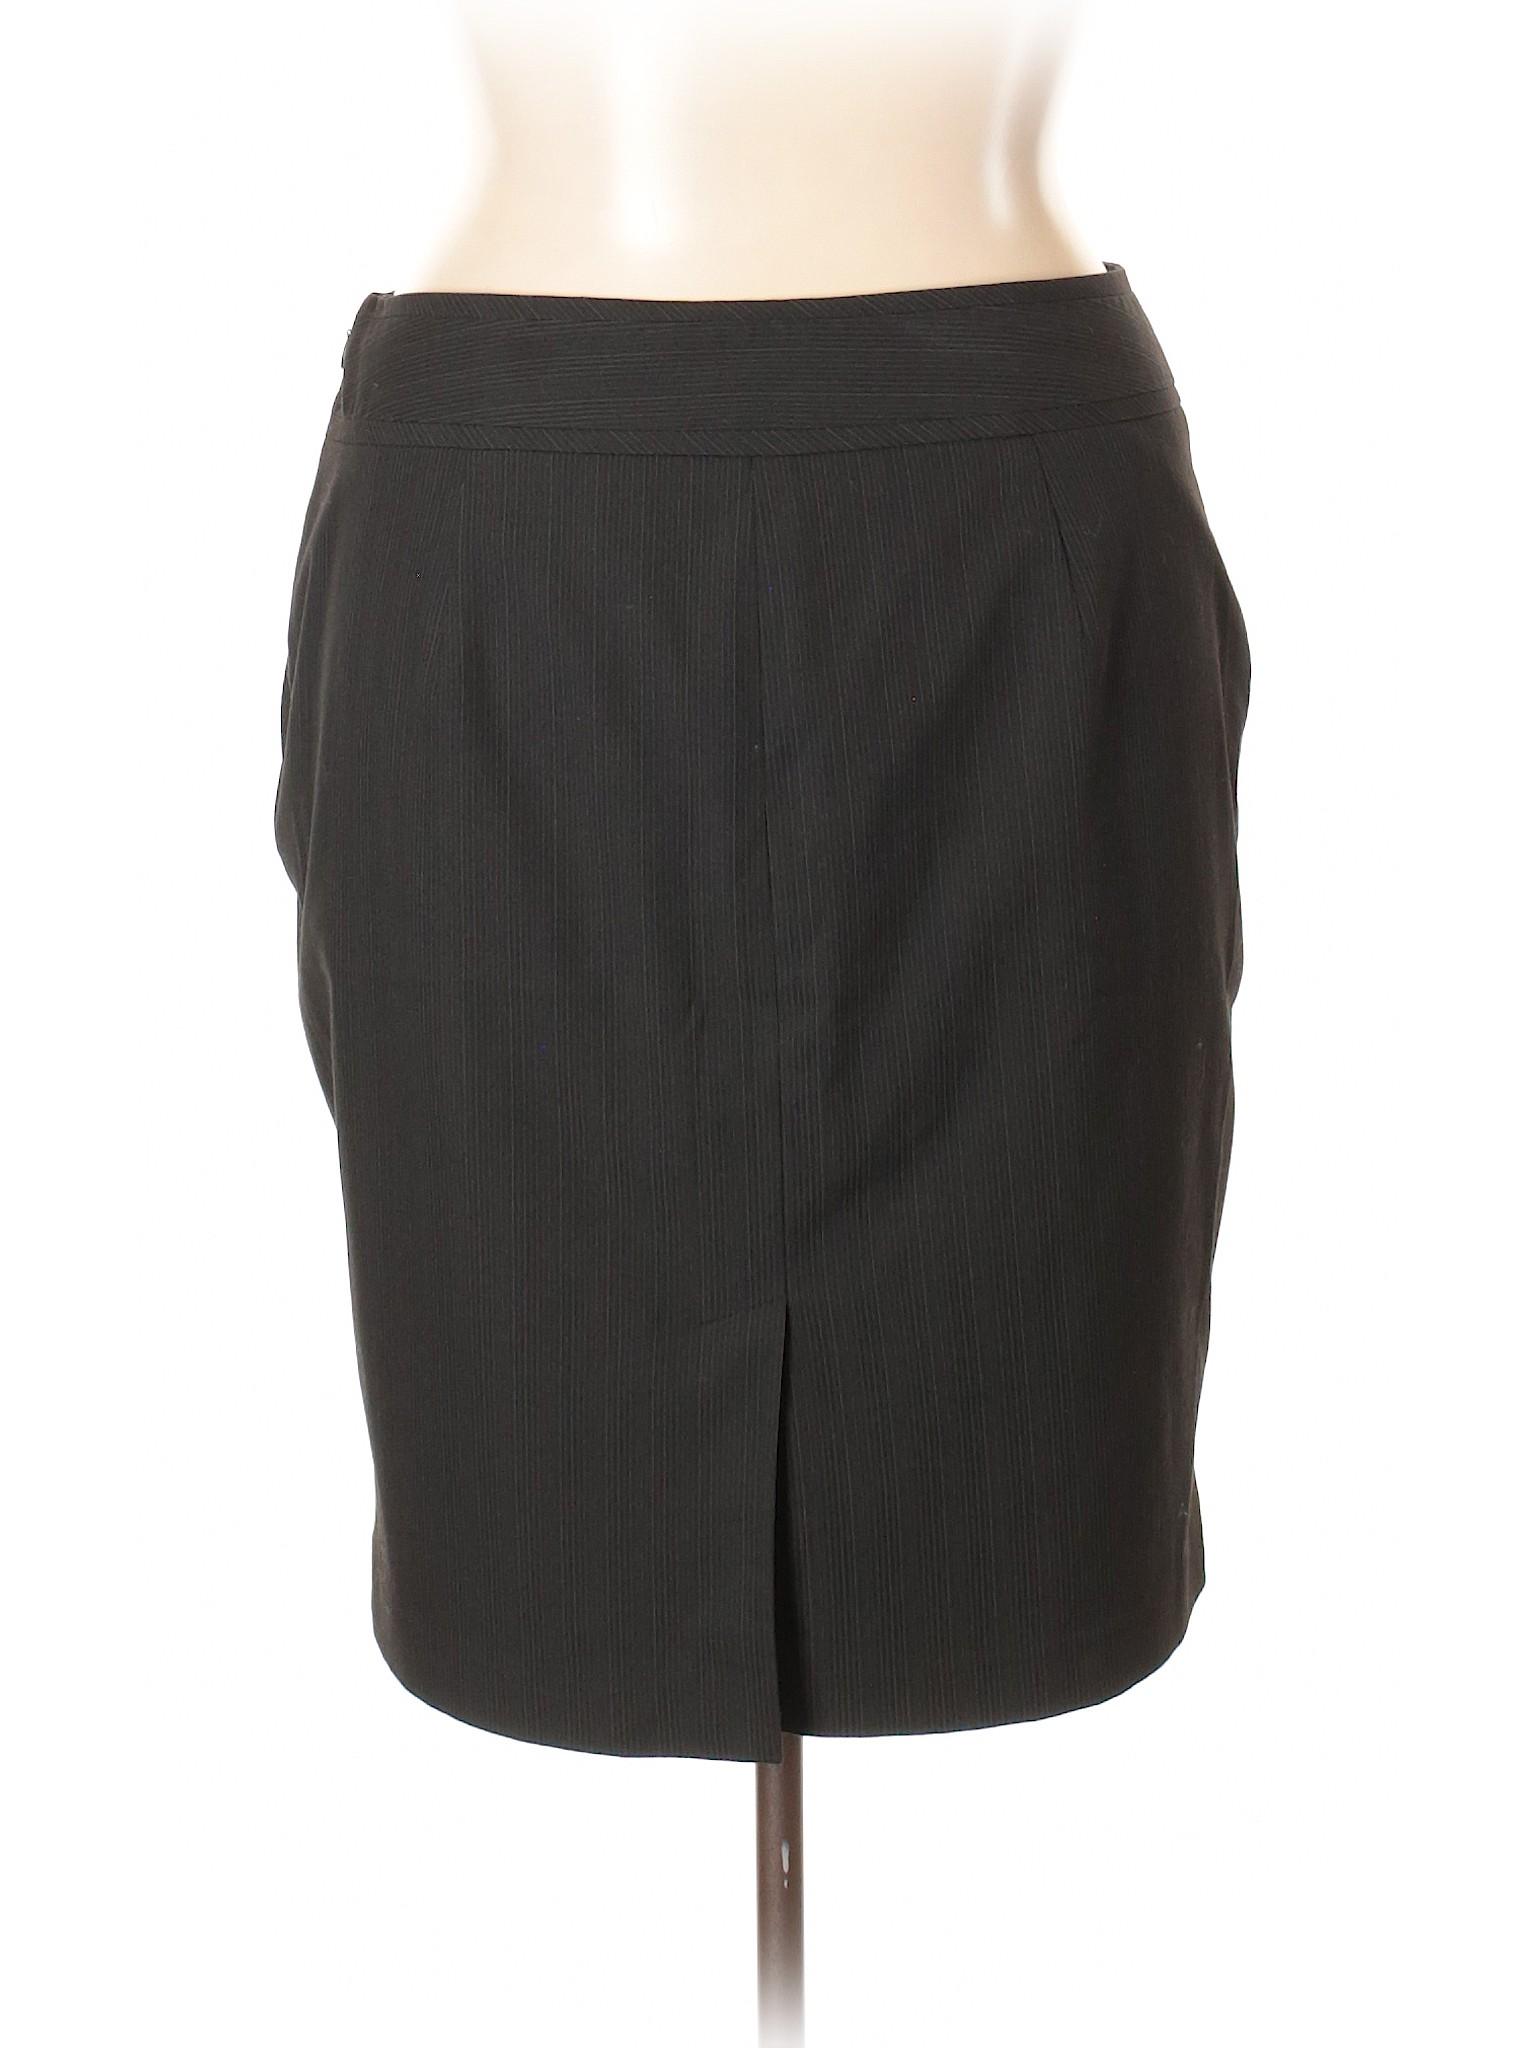 Skirt Casual Boutique Casual Skirt Casual Boutique Skirt Casual Boutique Boutique CHqazww